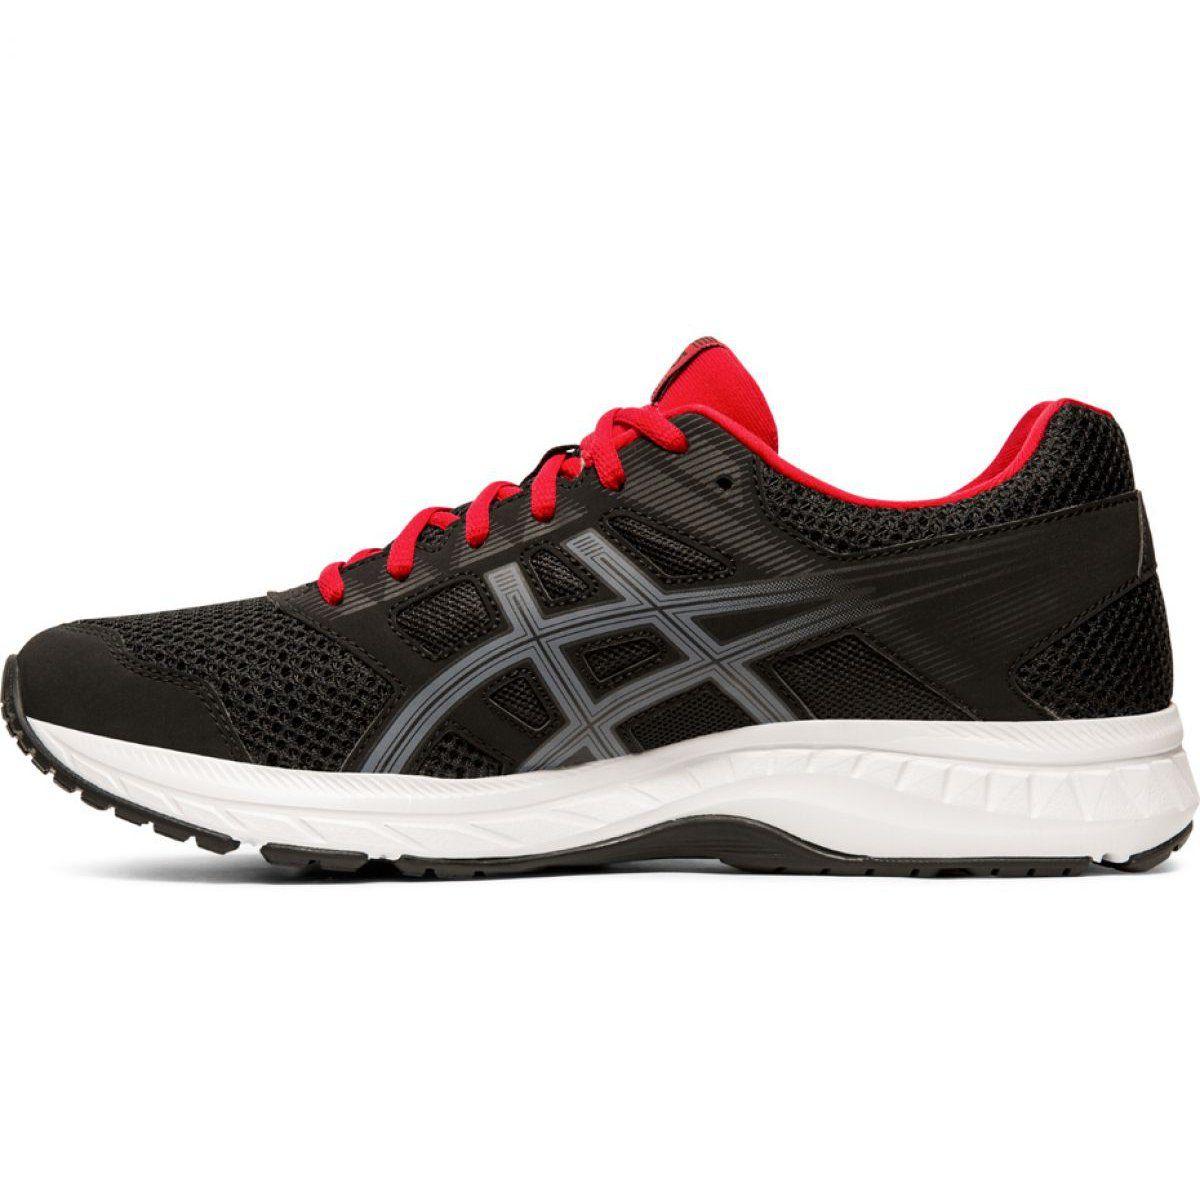 Treningowe Bieganie Sport Asics Buty Asics Gel Contend 5 M 1011a256 005 Czarno Czerwone Asics Running Shoes Asics Shoes Asics